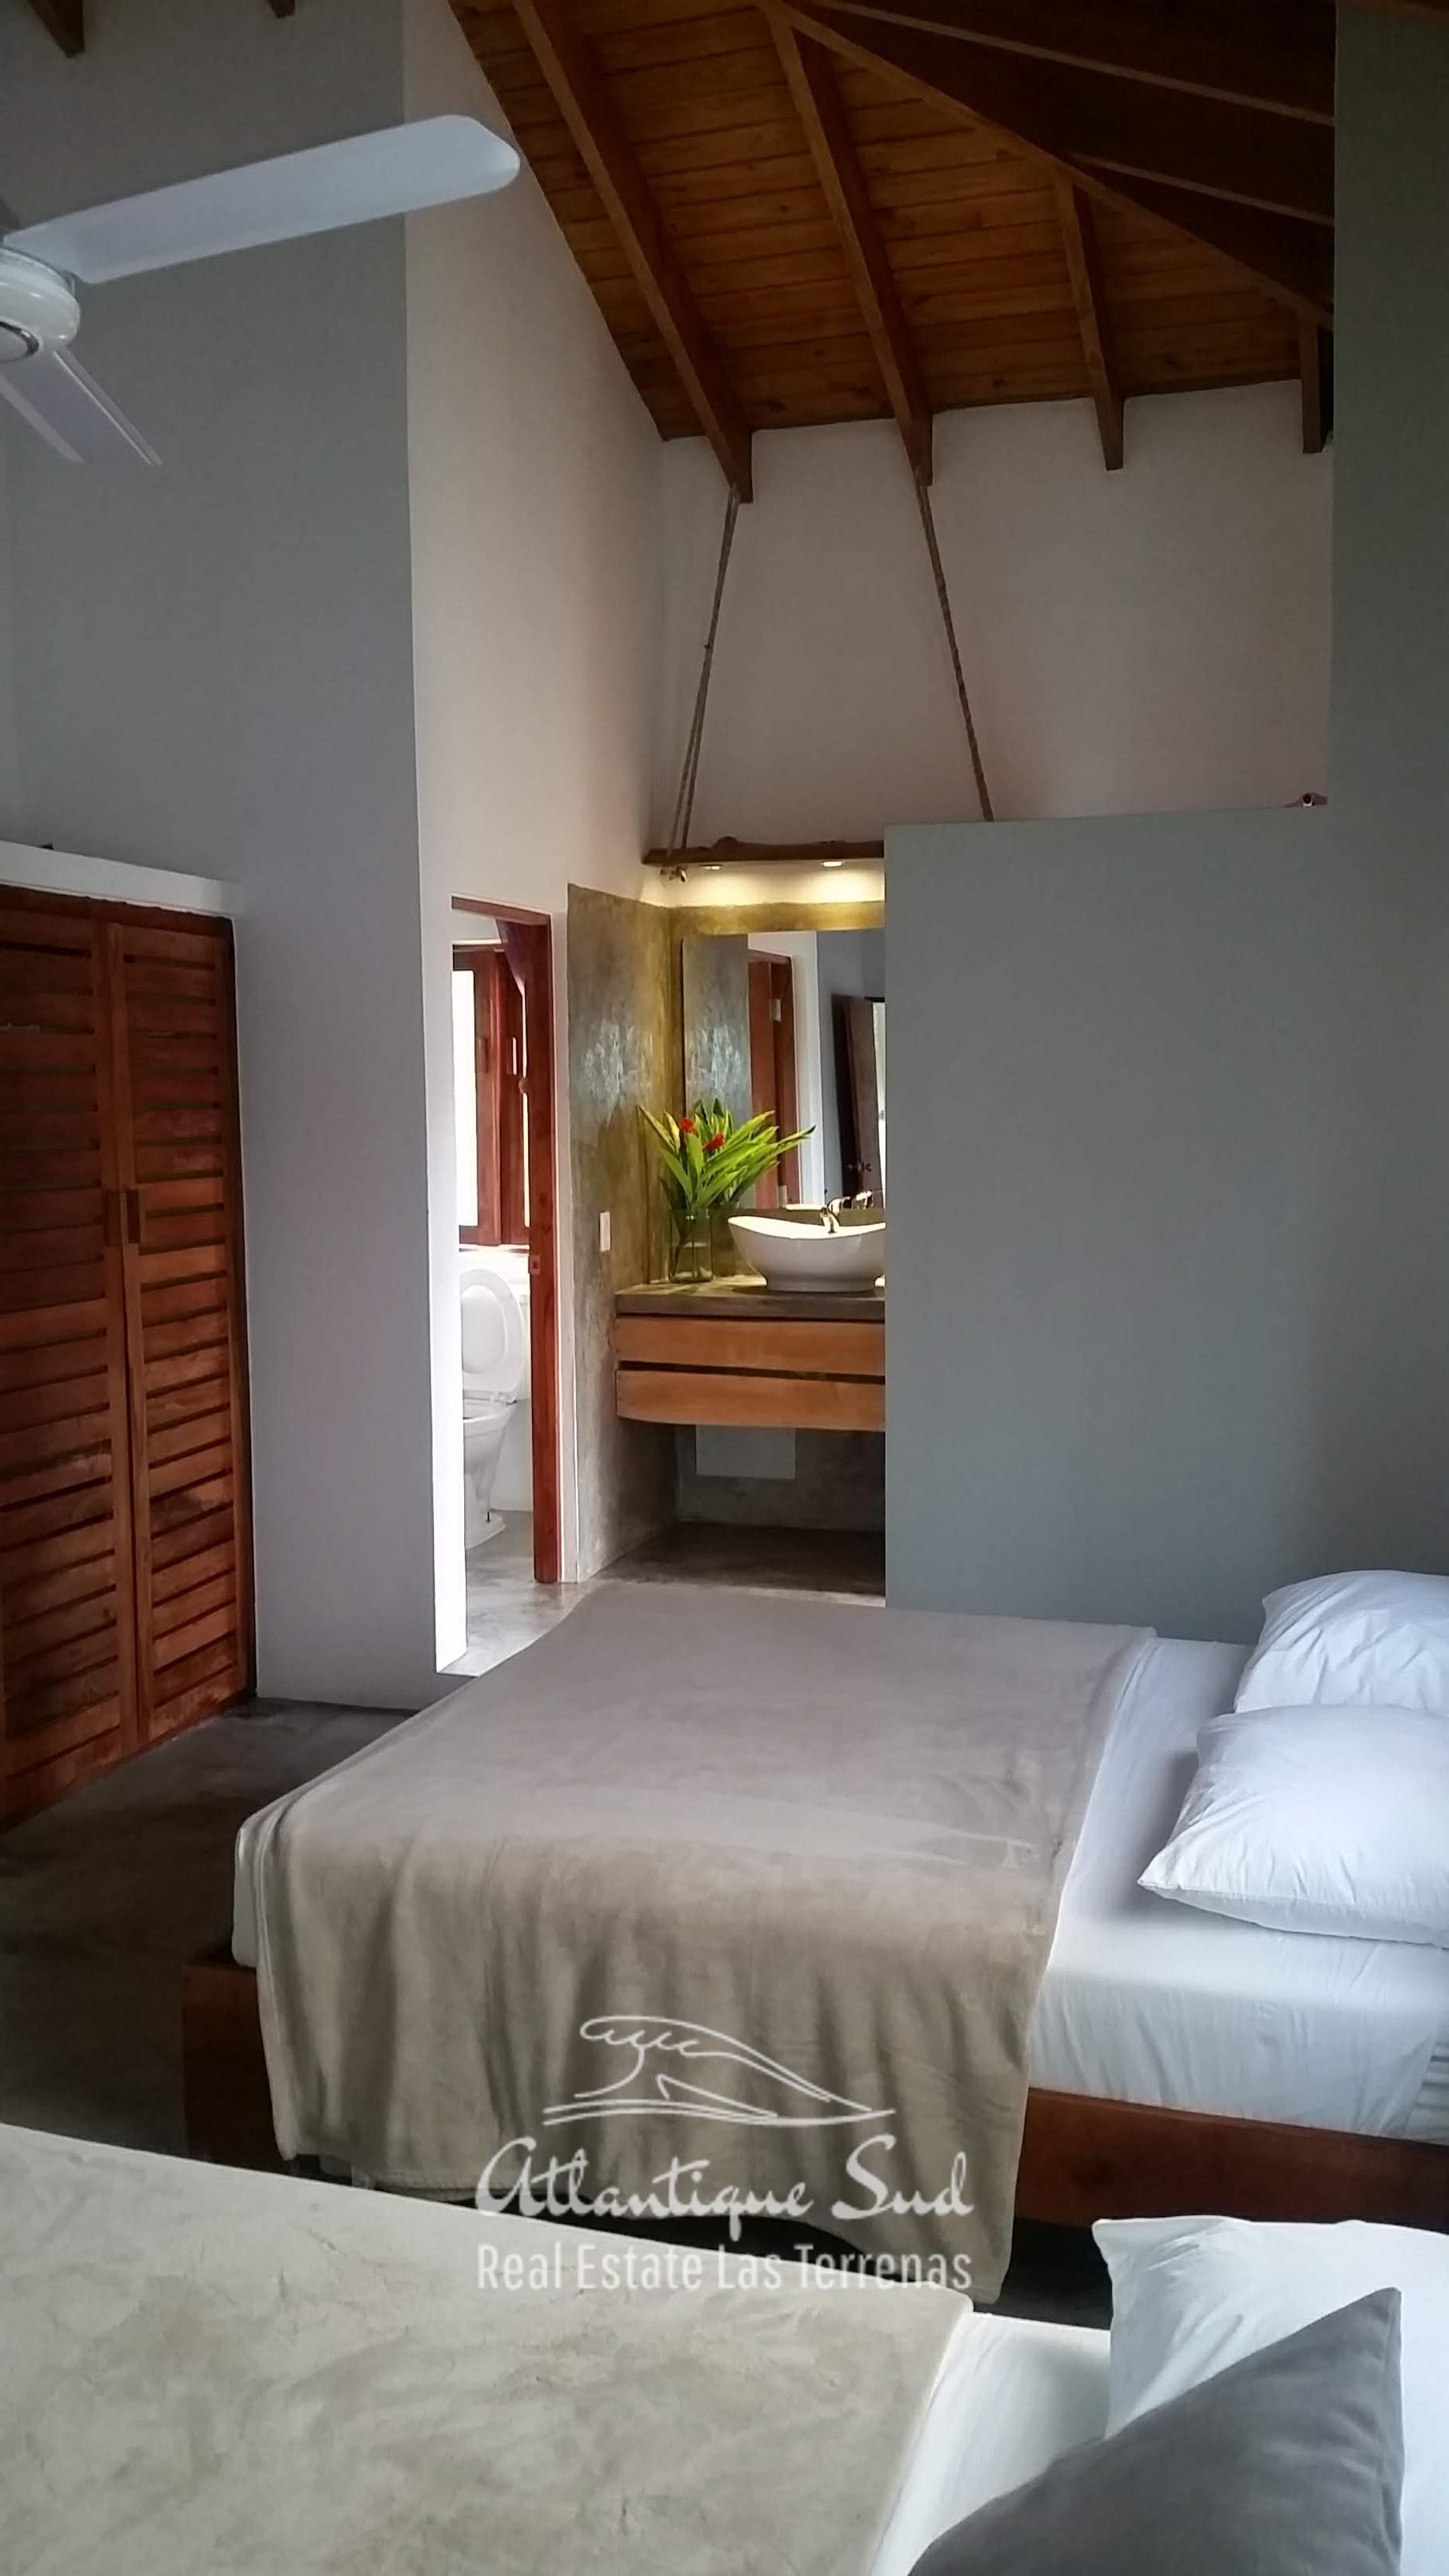 Typical caribbean hotel for sale Real Estate Las Terrenas Dominican Republic Atlantique Sud8.jpg